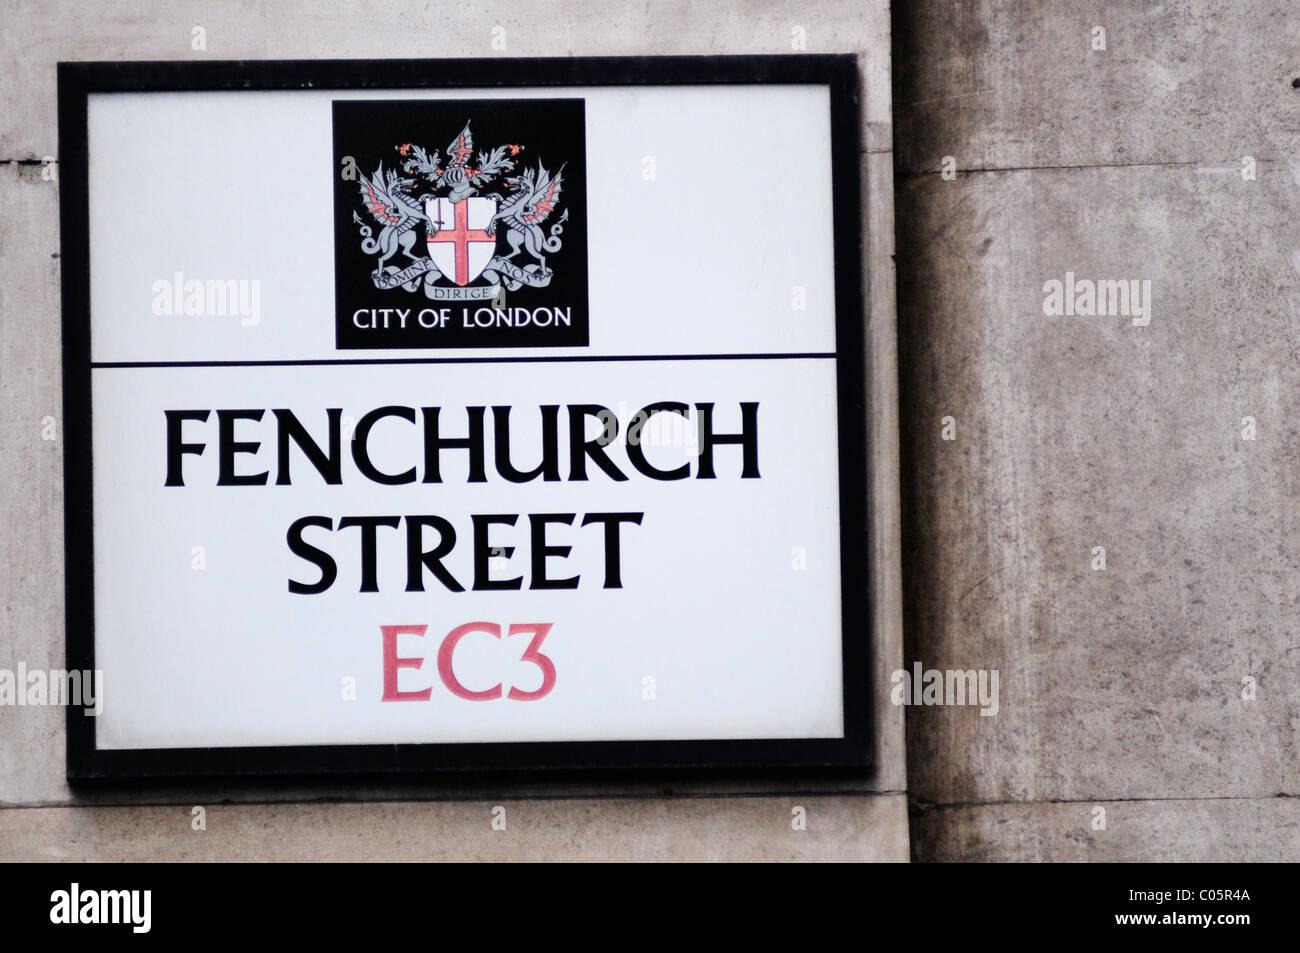 Fenchurch Street EC3 Street Sign, London, England, UK - Stock Image